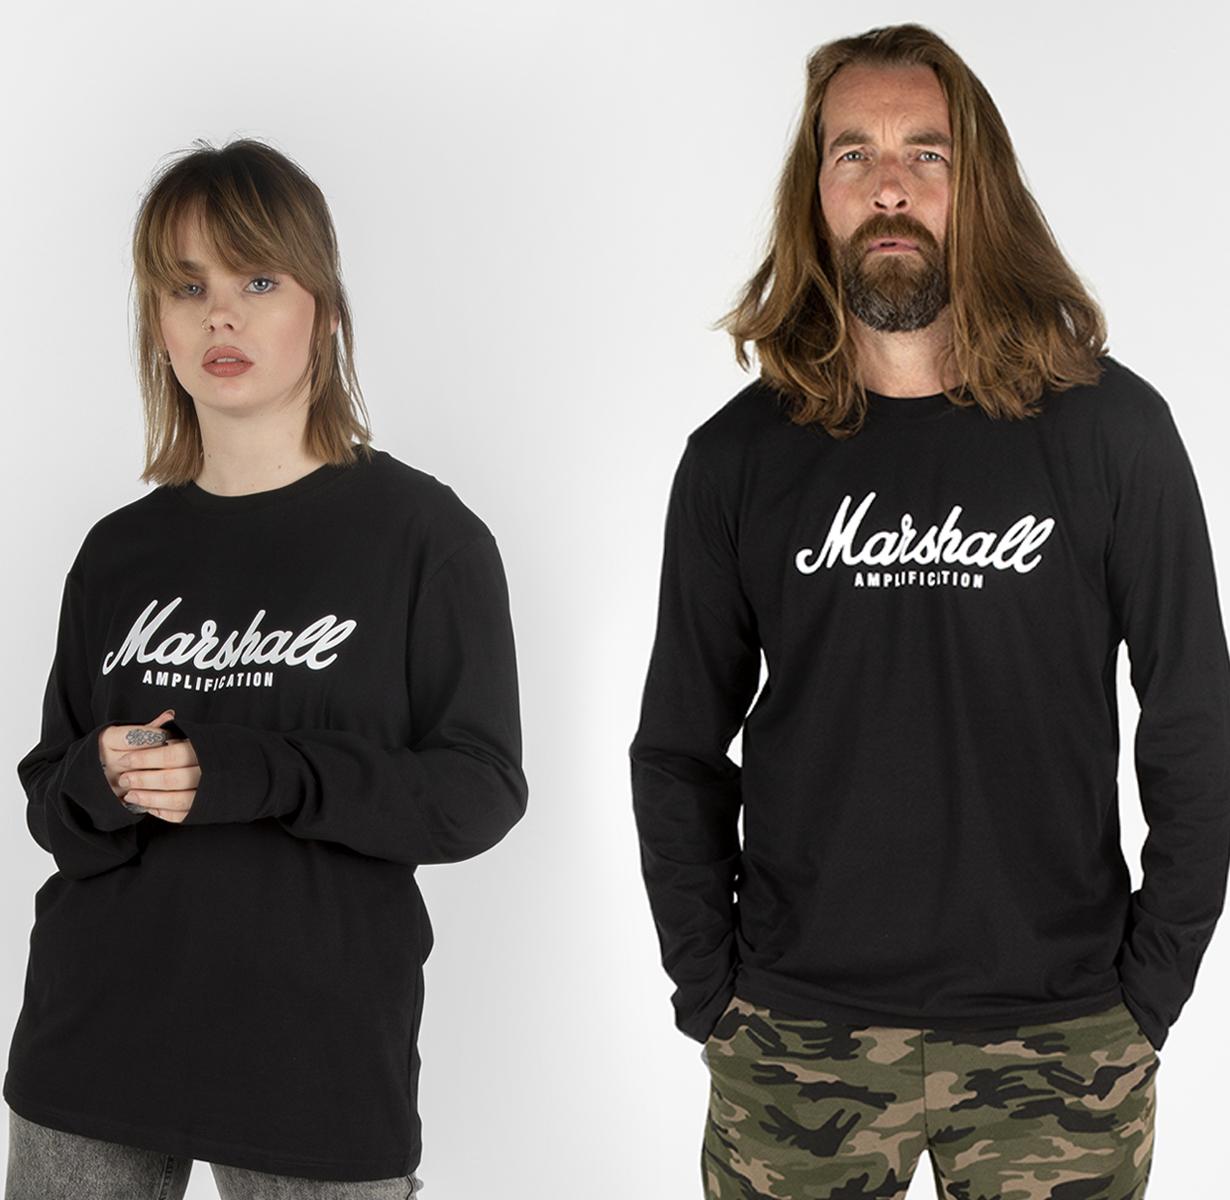 Marshall Long Sleeve Top